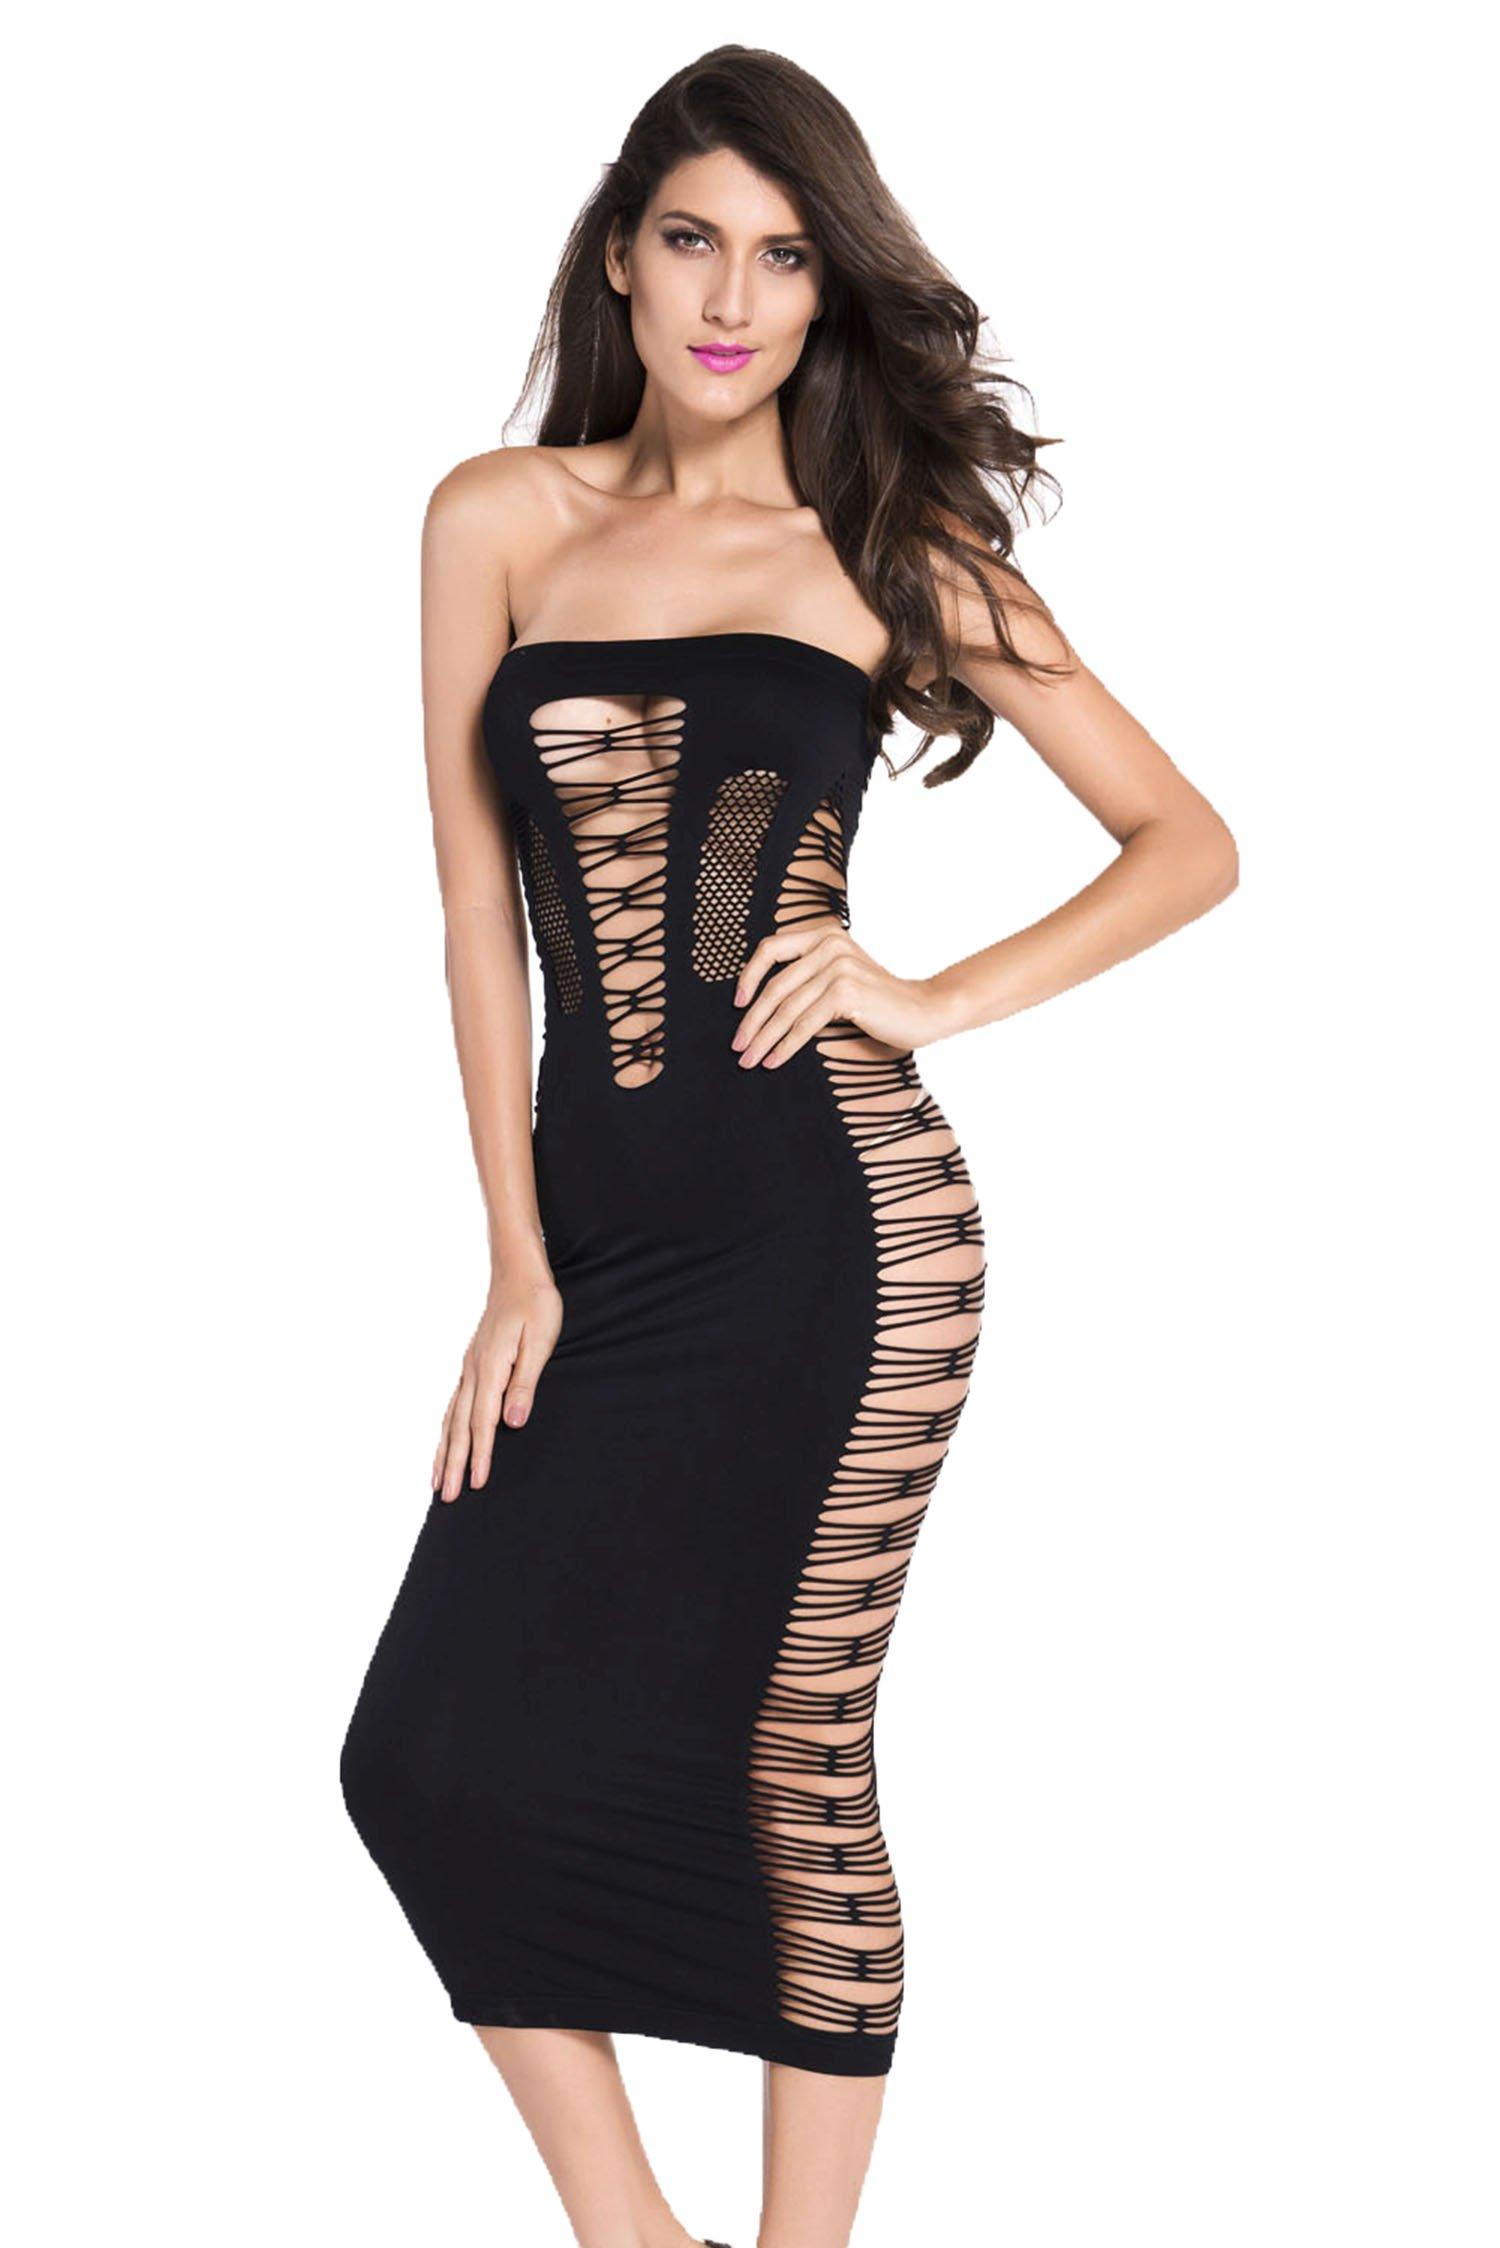 Topfly Big Spender Strapless Long Tube Dress Hollow Out Bandage Night Dress Black US XXS-L/Asian Free Size